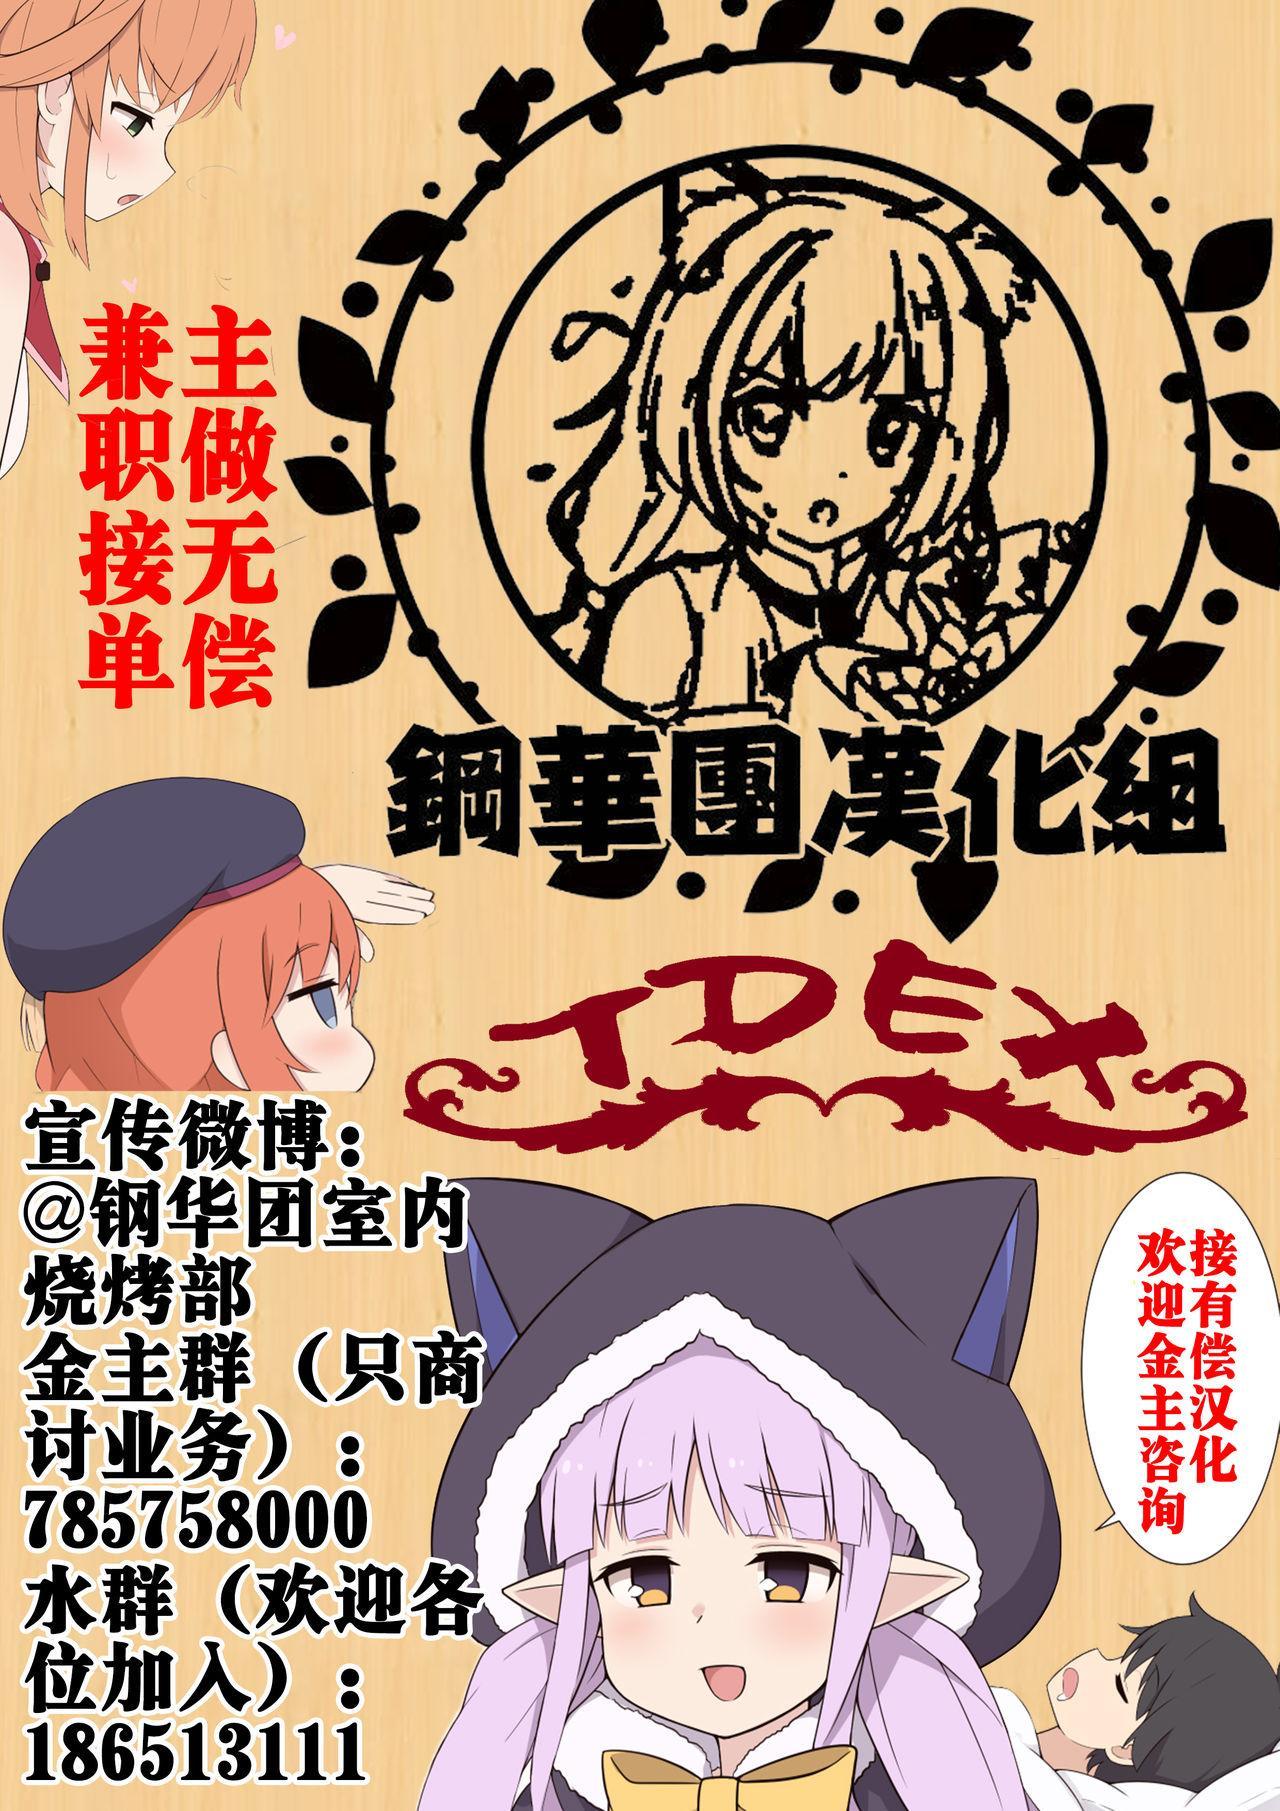 Kokkoro to Cosplay Ecchi Suru dake no Ohanashi | 只是和可可萝进行角色扮演性爱的故事 5